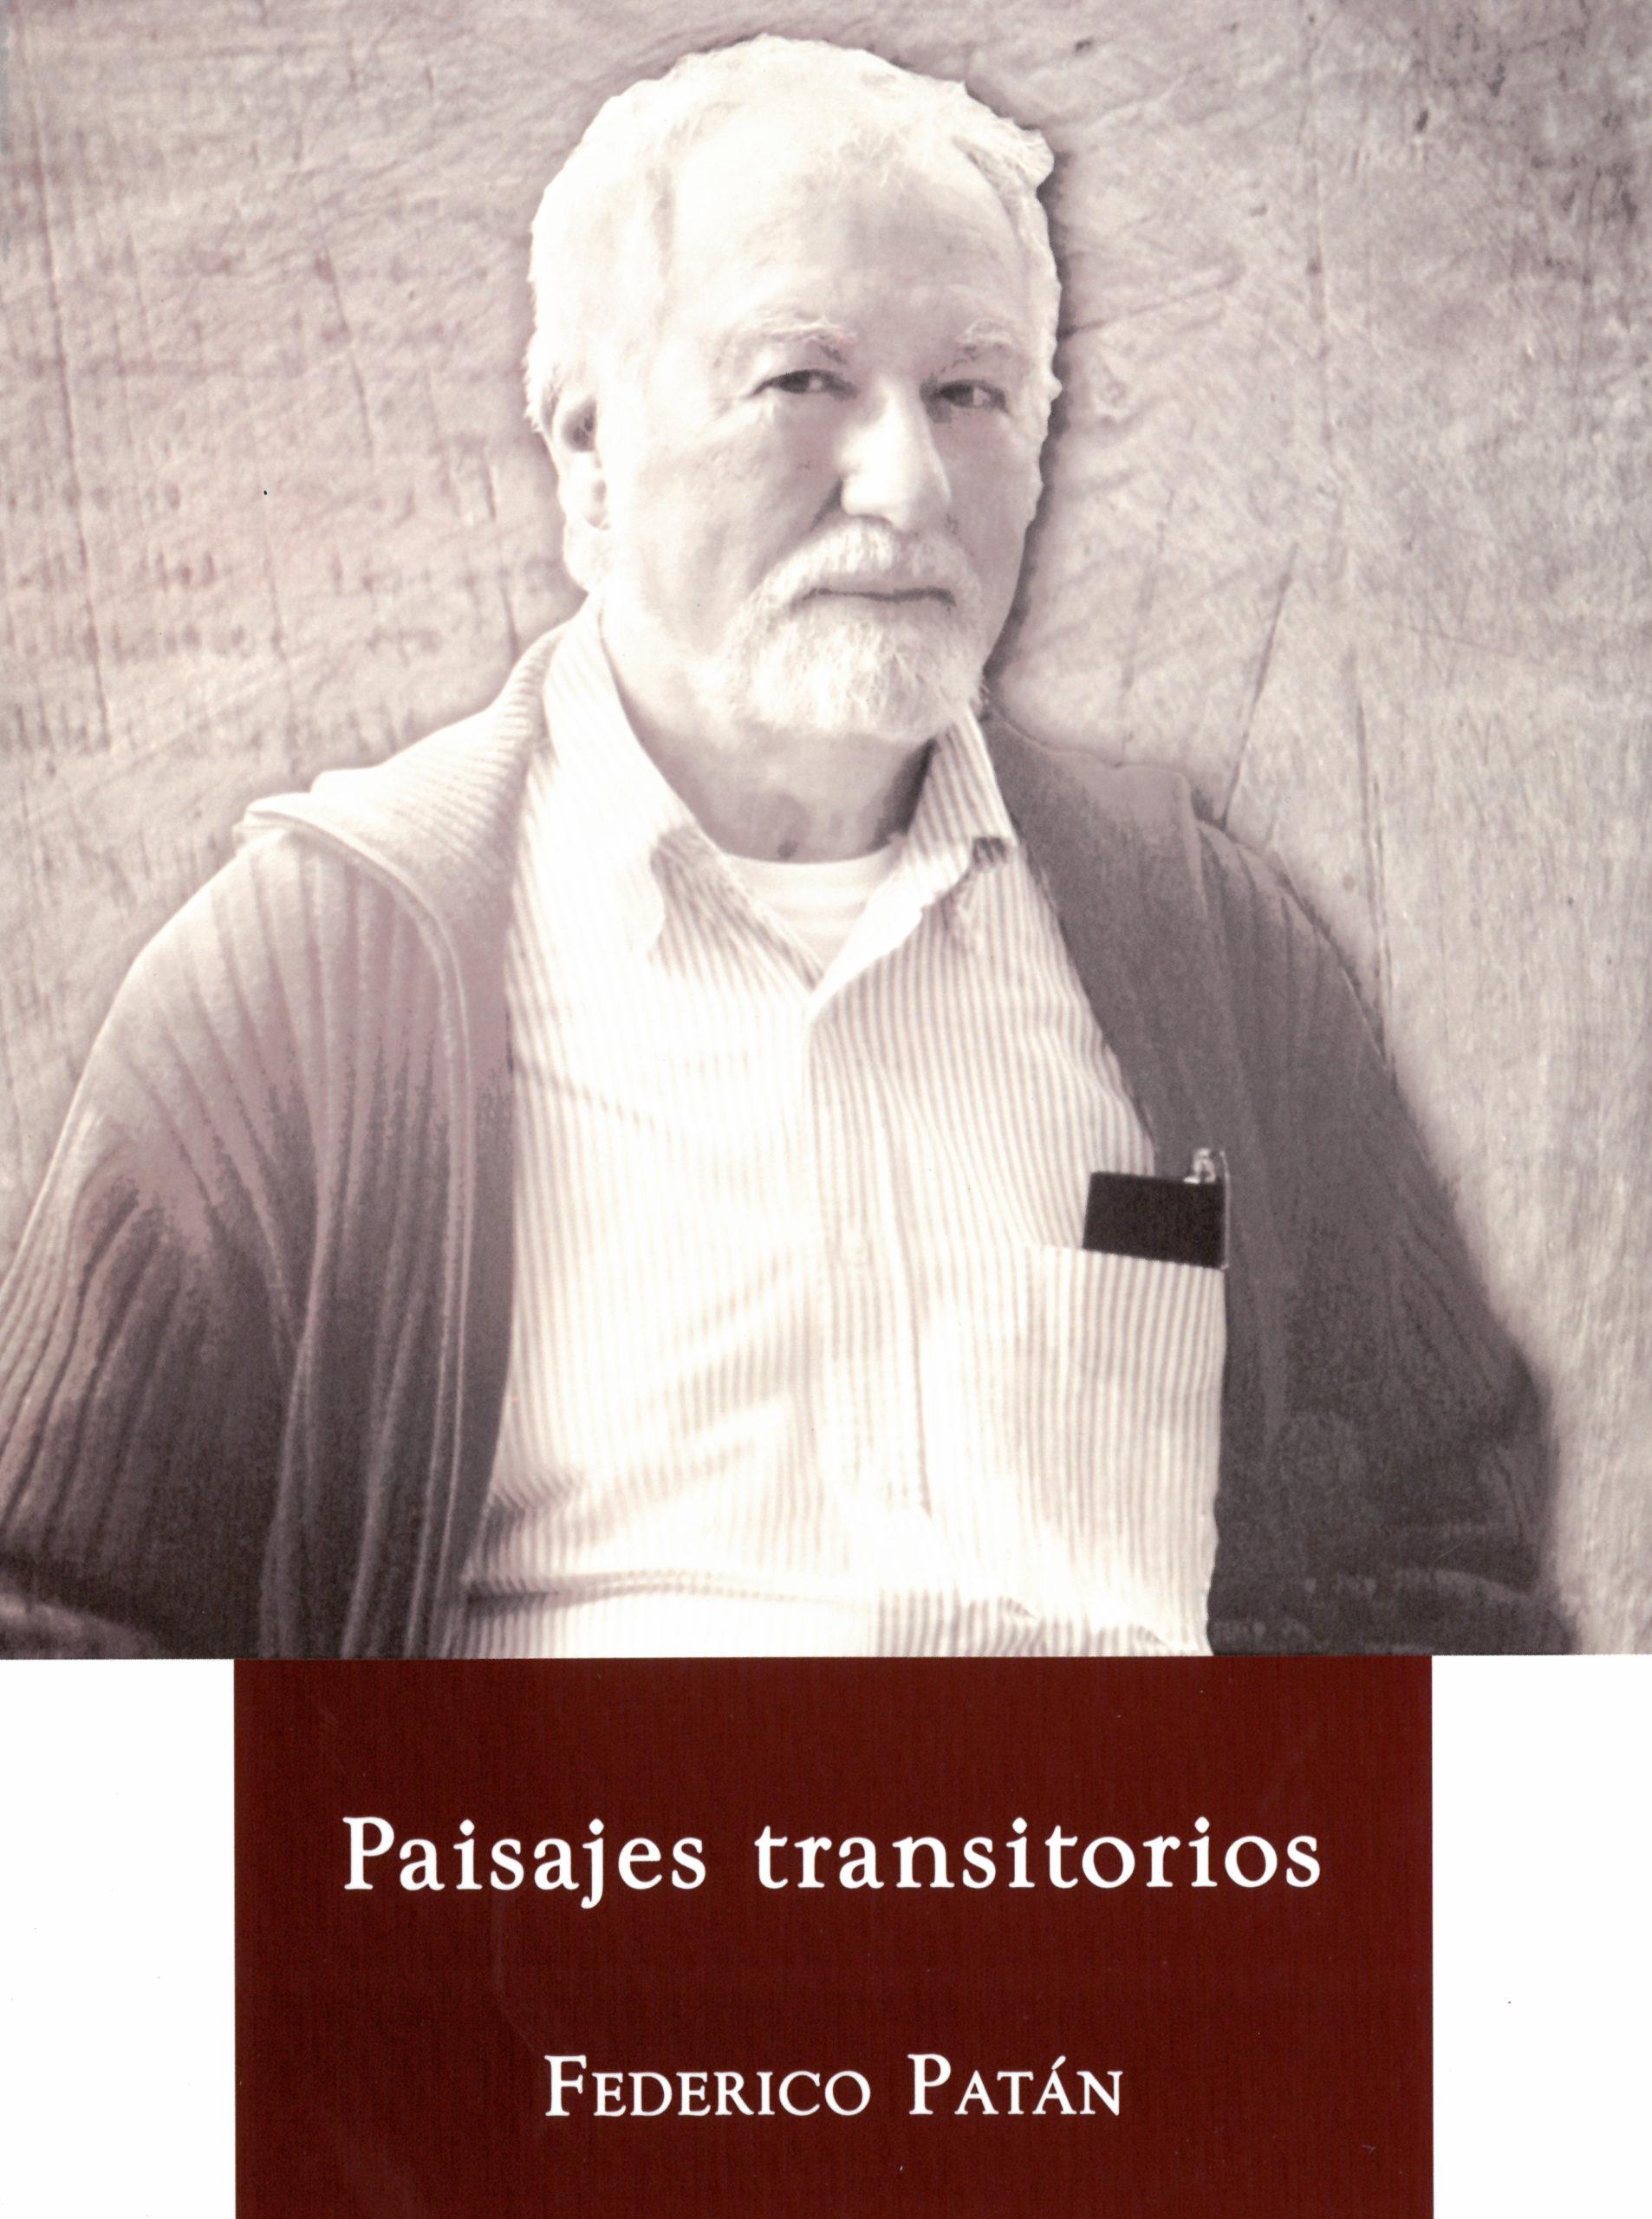 Paisajes Transitorios Image